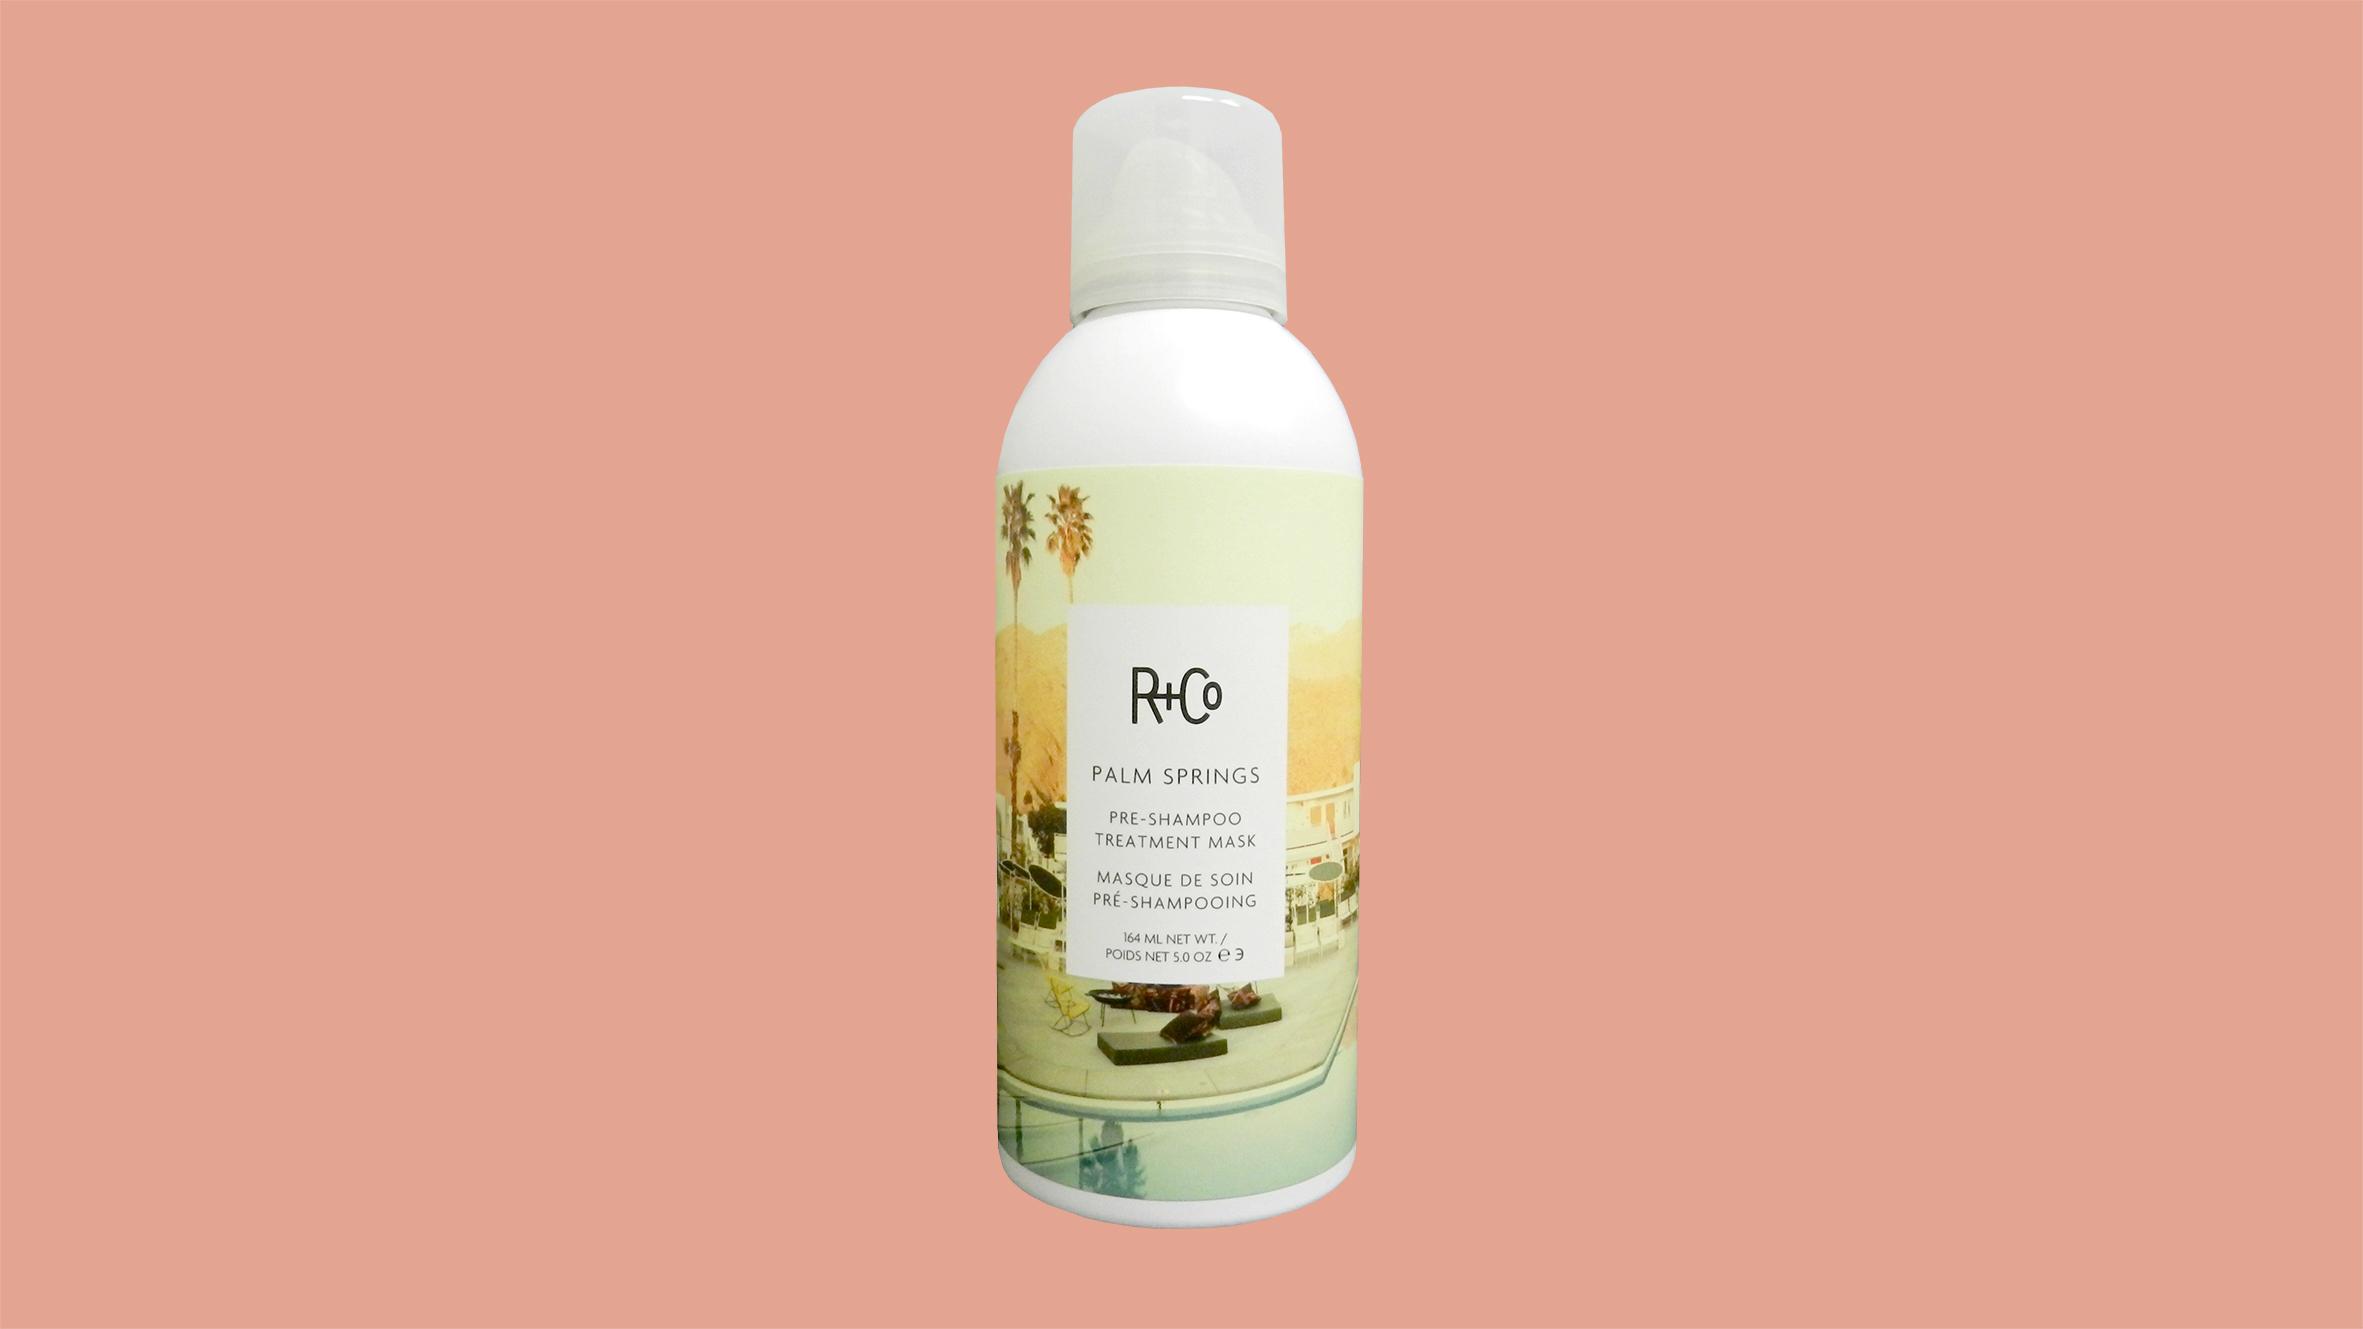 R+CO Palm Springs Pre-Shampoo Treatment Mask